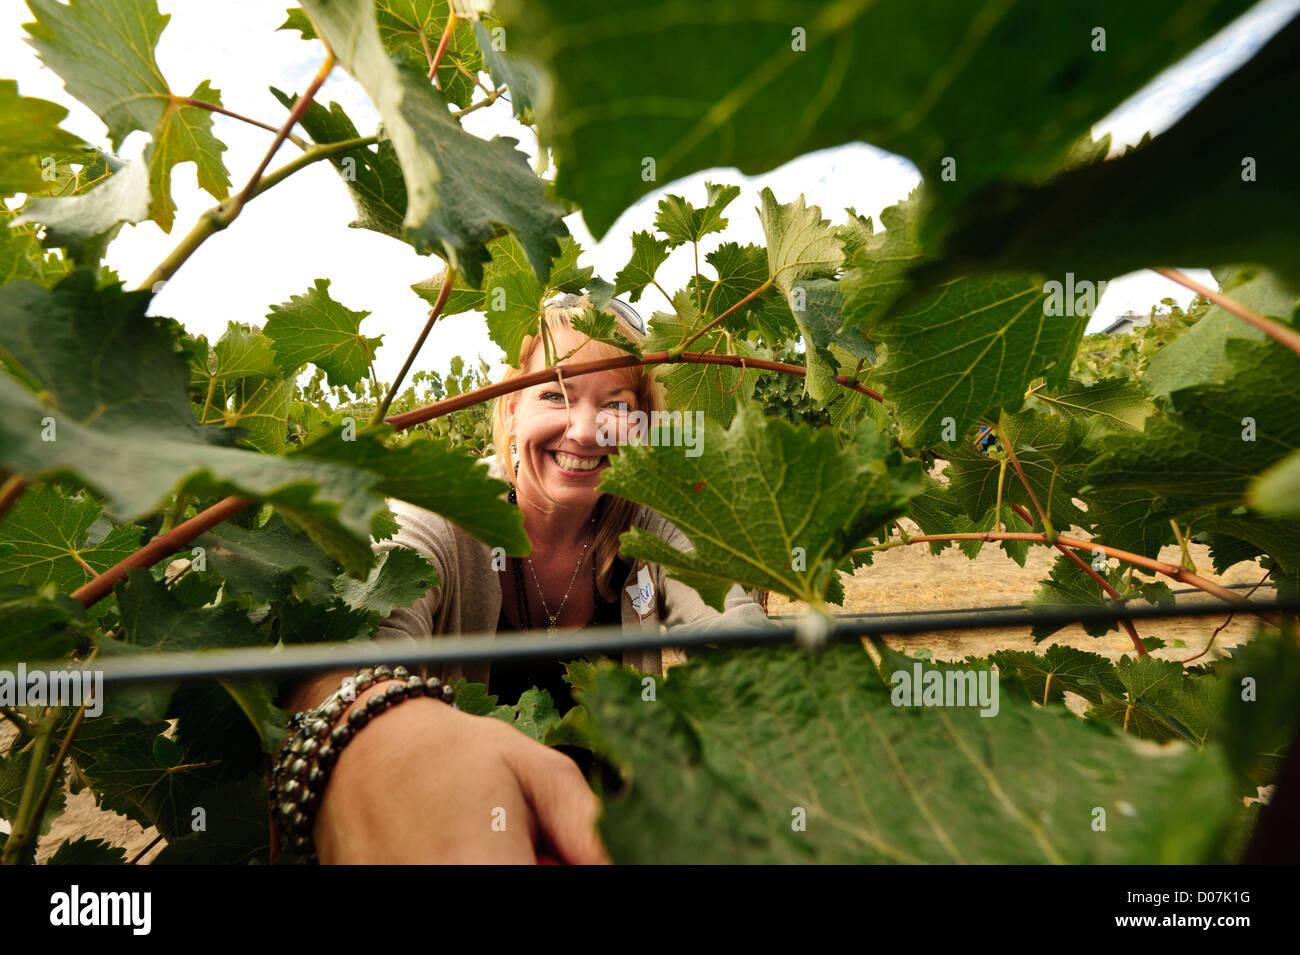 USA Washington Outlook Rattlesnake Hills AVA. Volunteer picker harvests Chenin Blanc grapes from Tefft Cellars main vineyard & USA Washington Outlook Rattlesnake Hills AVA. Volunteer picker ...